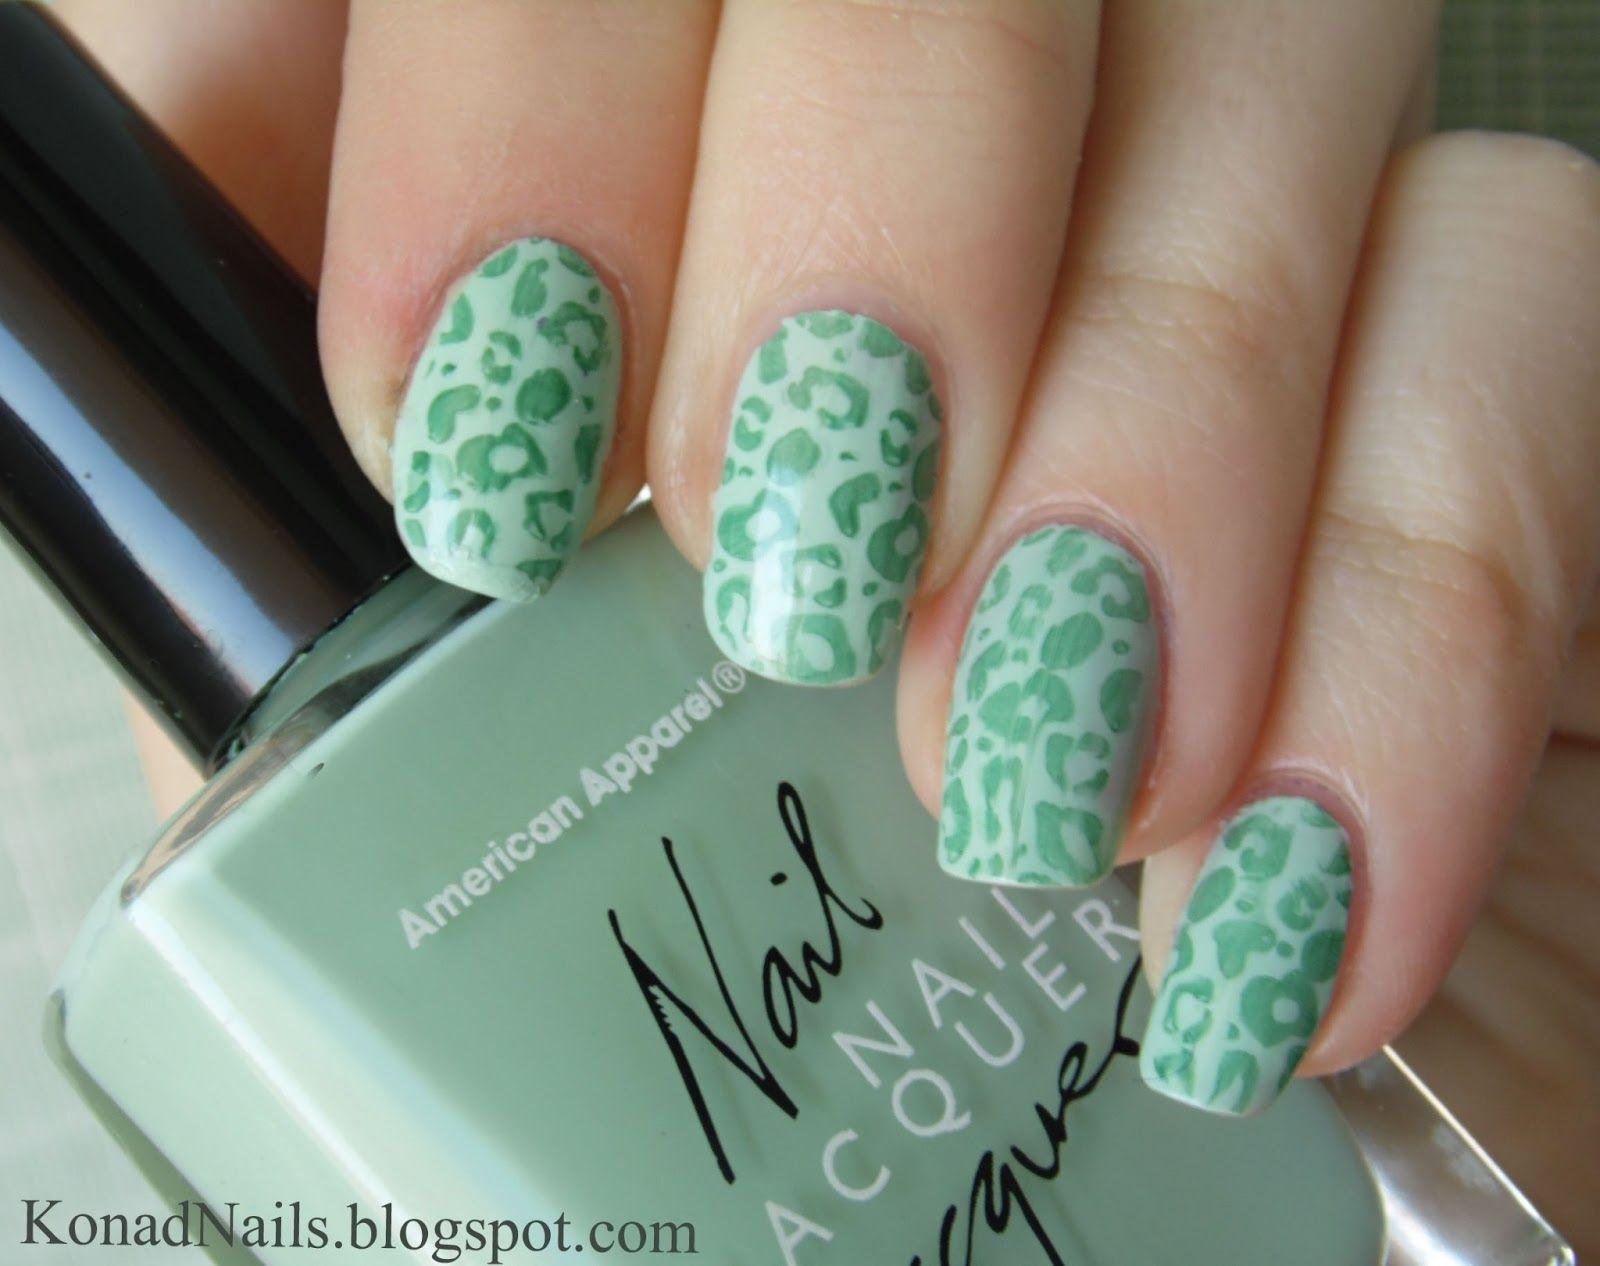 Konad m57 en doble verde   Nails - Manicura   Pinterest   Uña ...